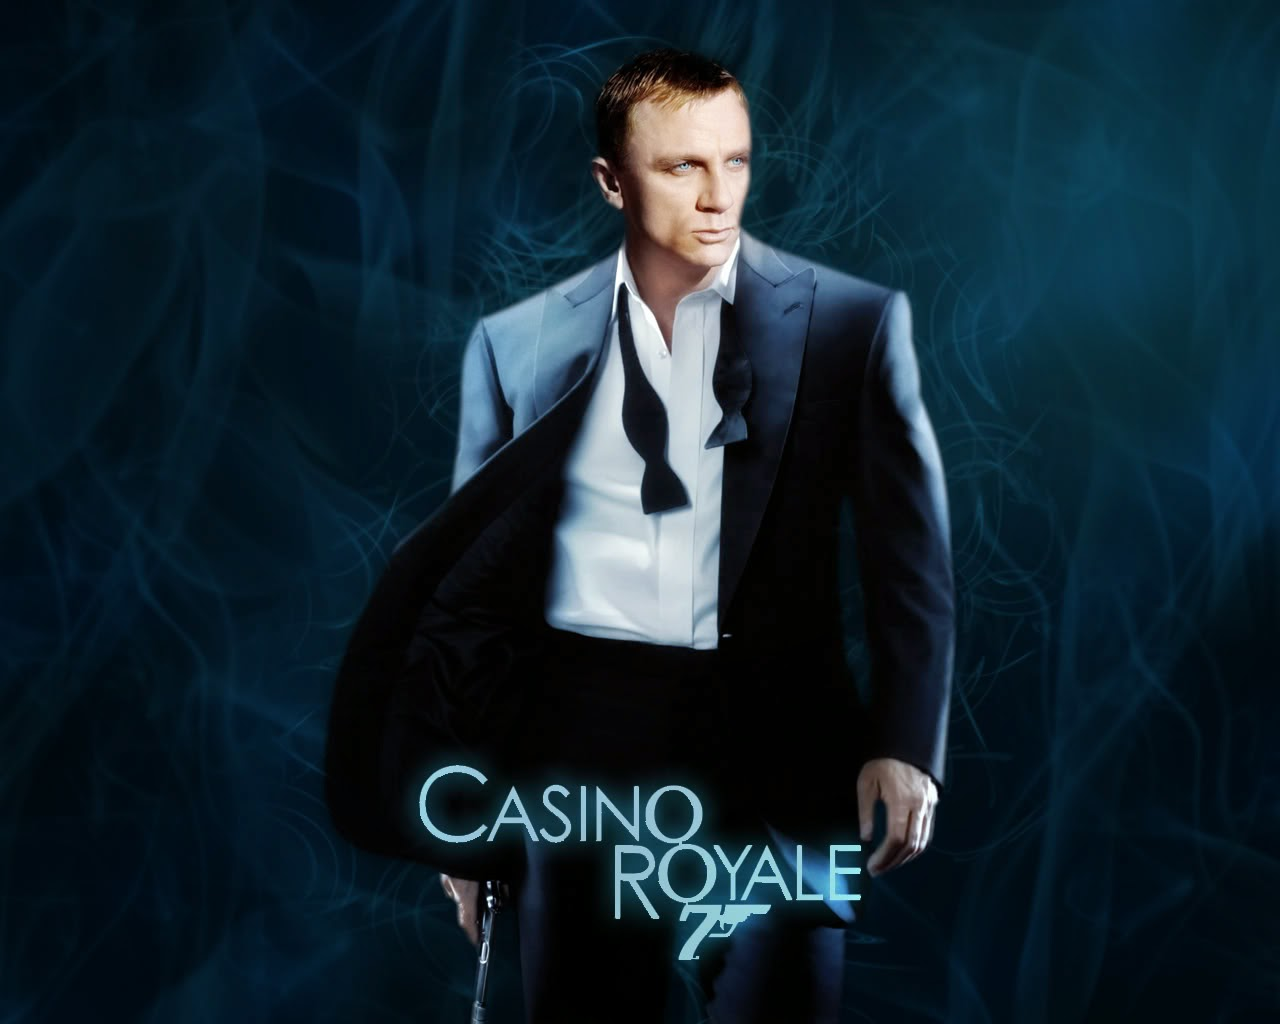 Casino royale parkour chase scene